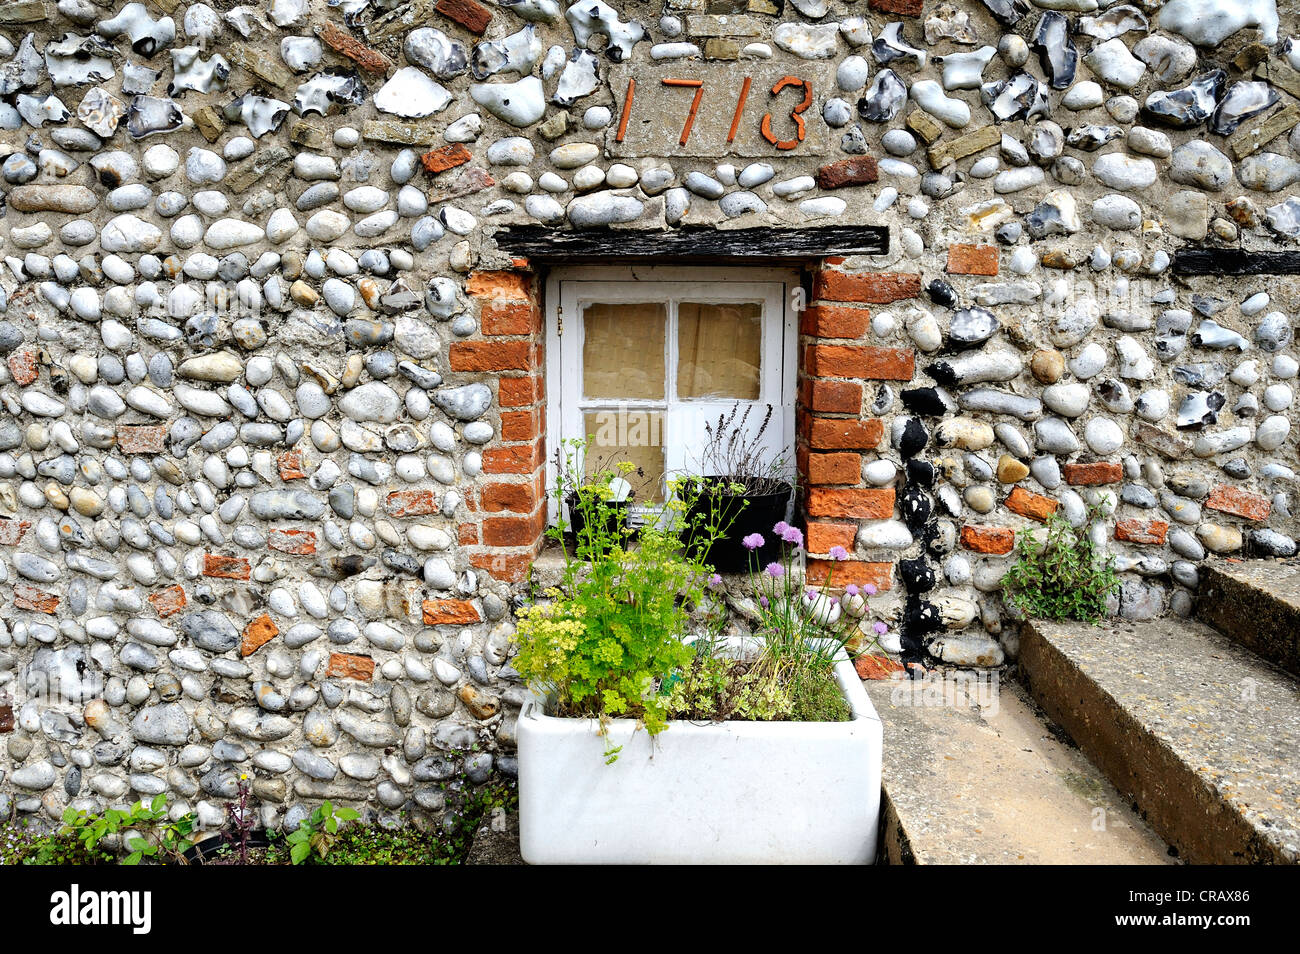 Stone Building Materials : Houses made of bricks in kenya